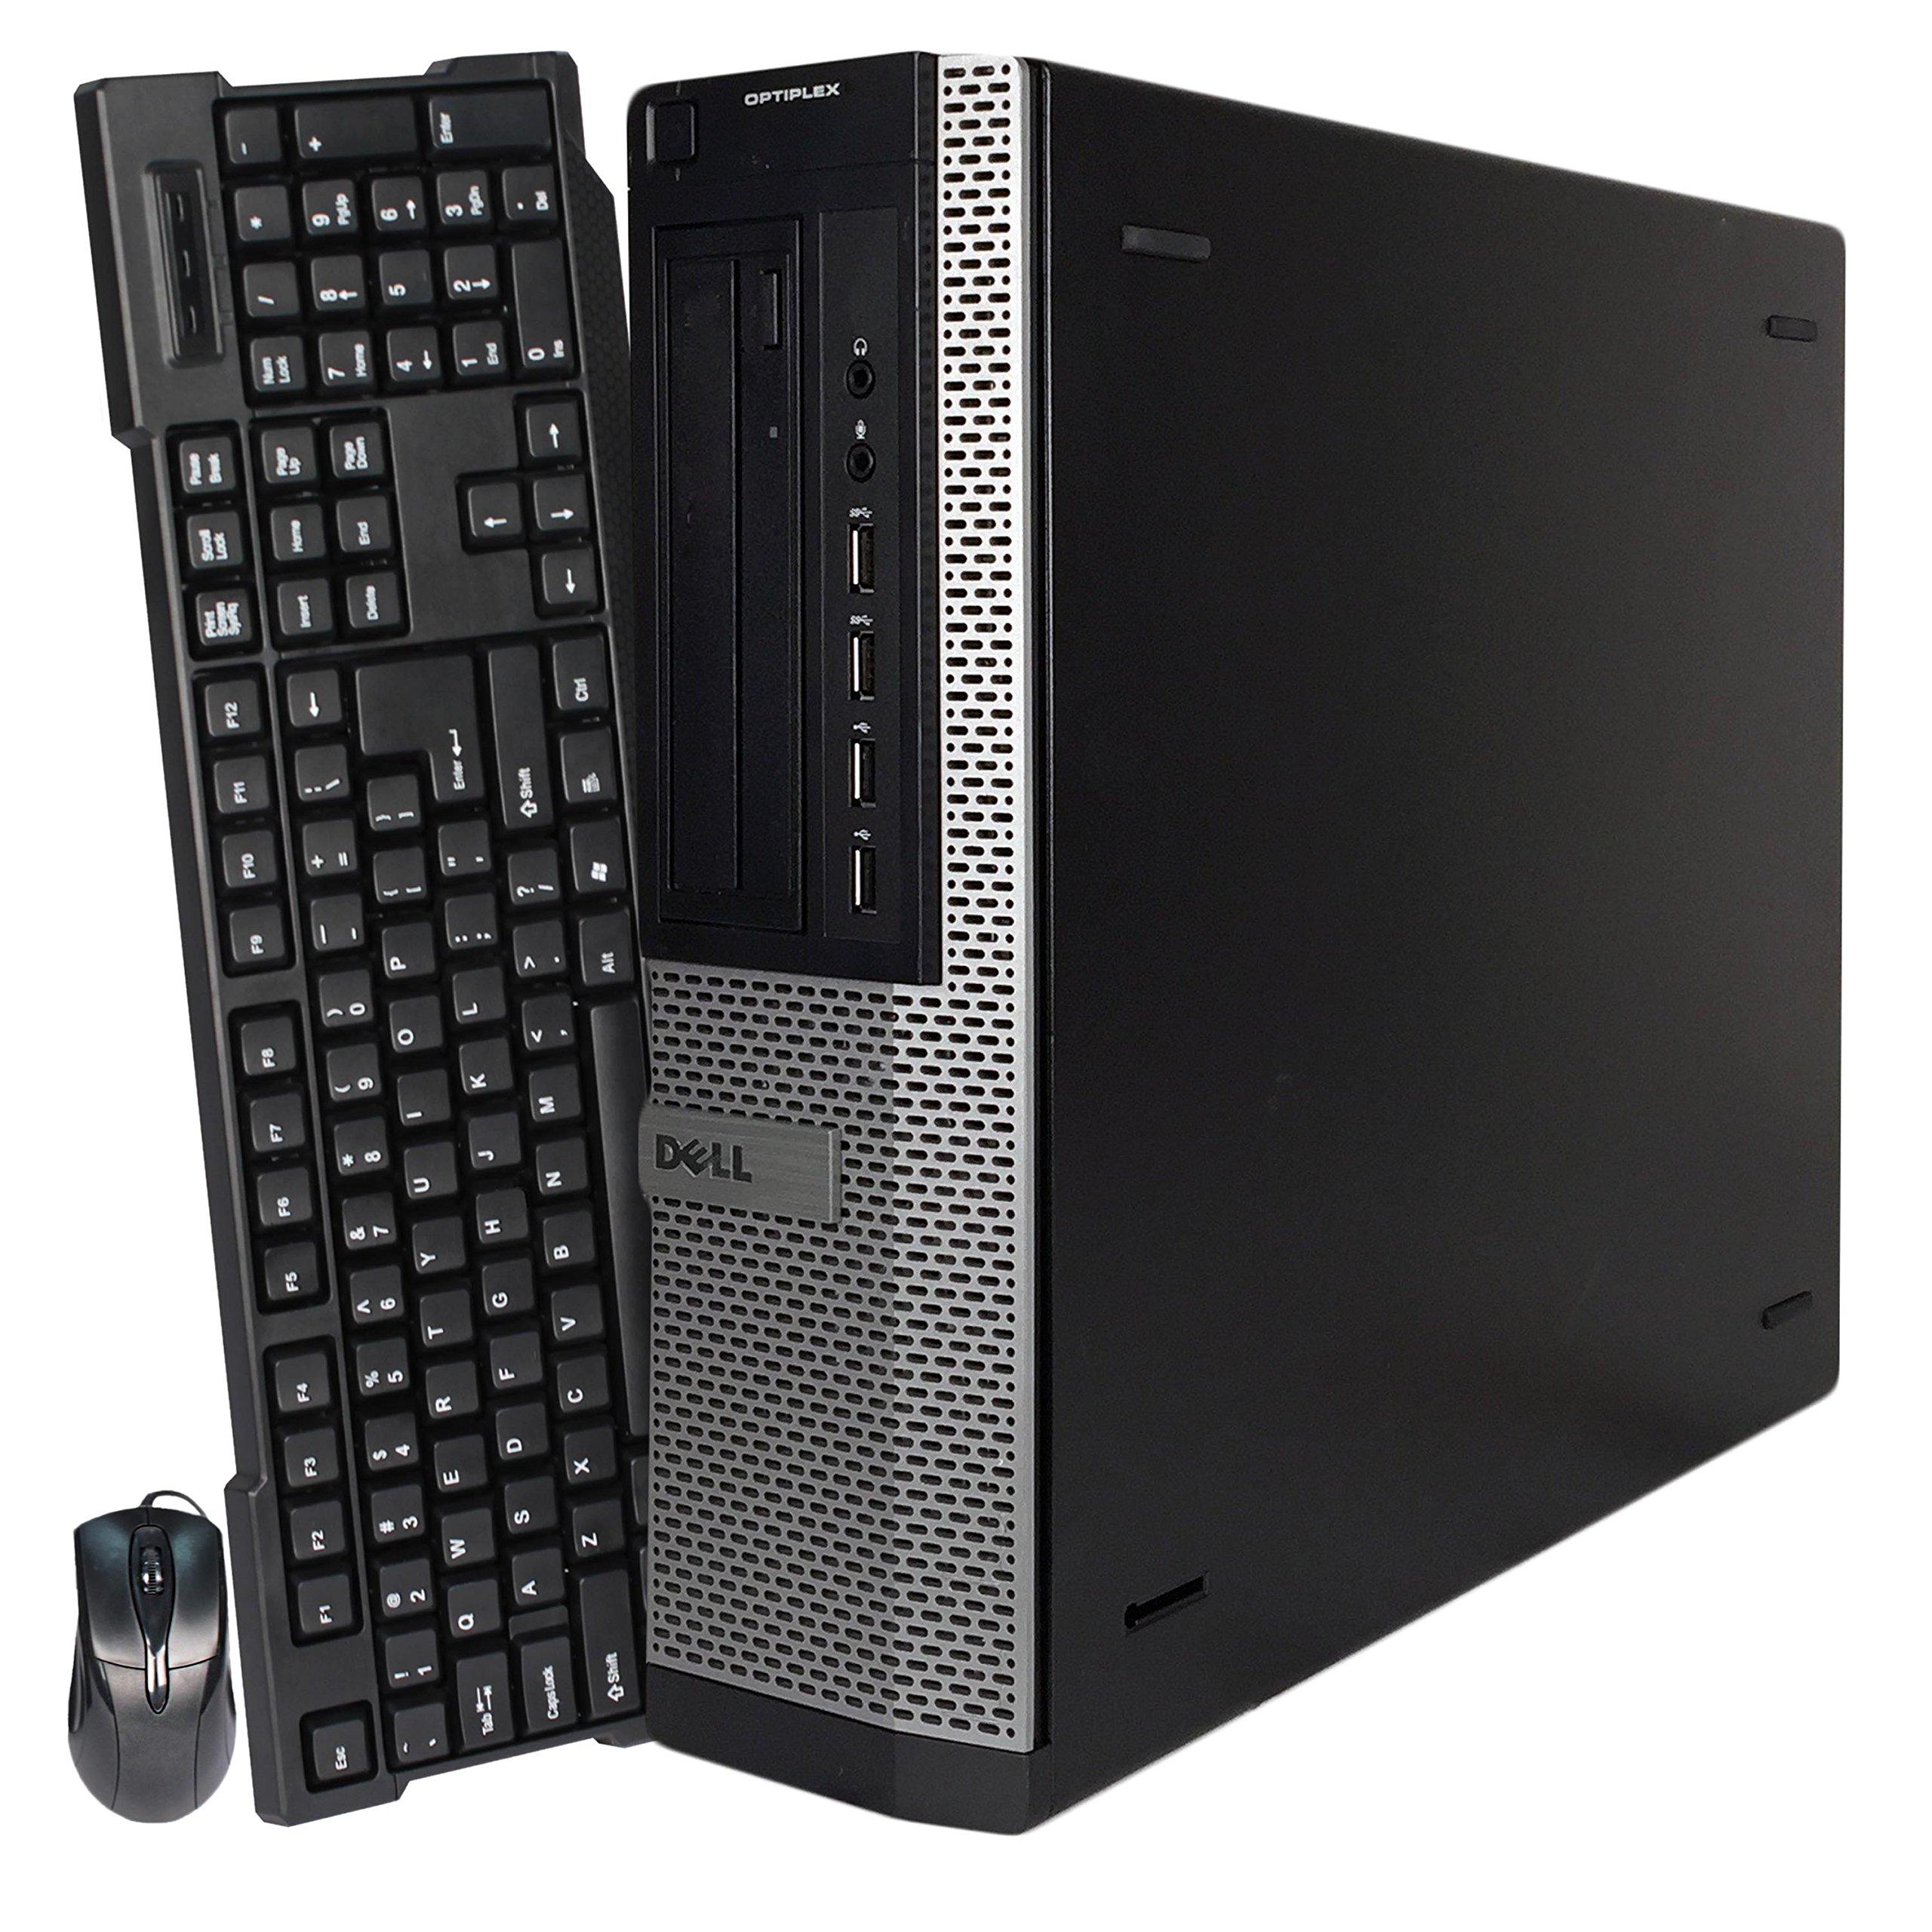 2017 Dell Optiplex 7010 Desktop Computer, Intel Core i5-3470 Quad-Core 3.2GHz (up to 3.8GHz Processor), 8GB DDR3, 500GB HDD, DVD, Windows 10 Professional (Certified Refurbished)